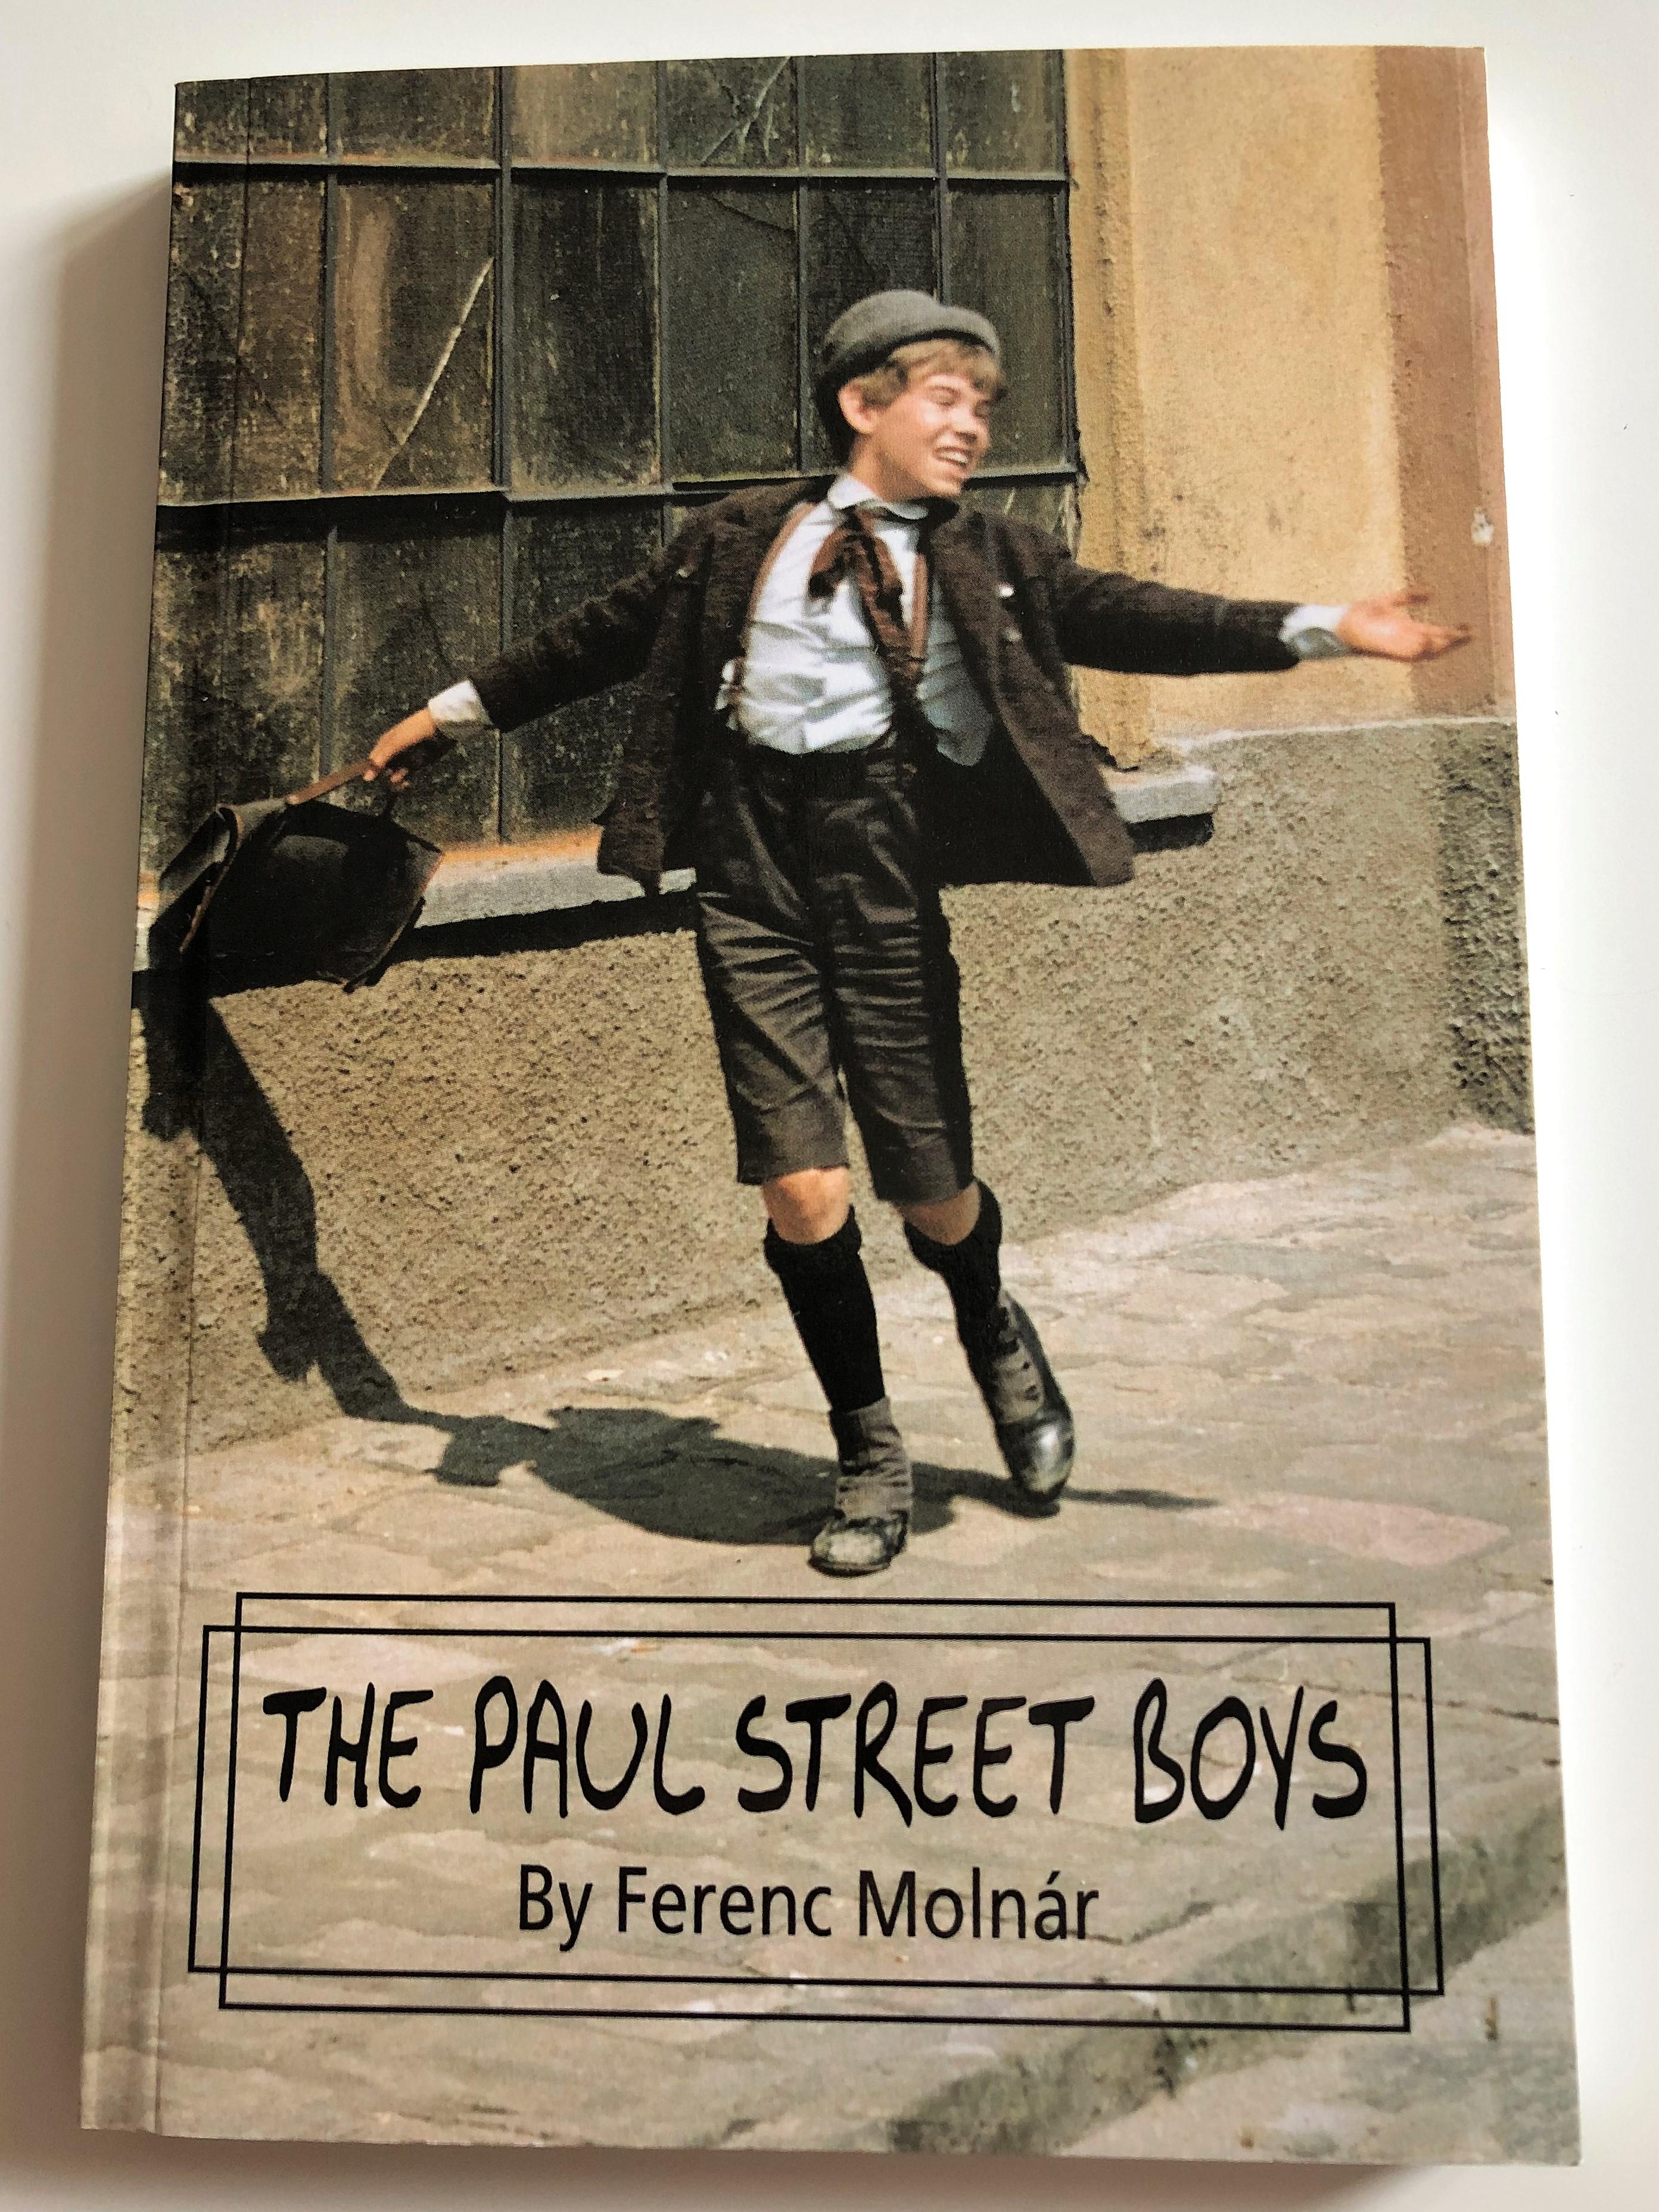 the-paul-street-boys-ferenc-moln-r-p-l-utcai-fi-k-in-english-language-paperback-corvina-2015-hungarian-literary-classic-1-.jpg